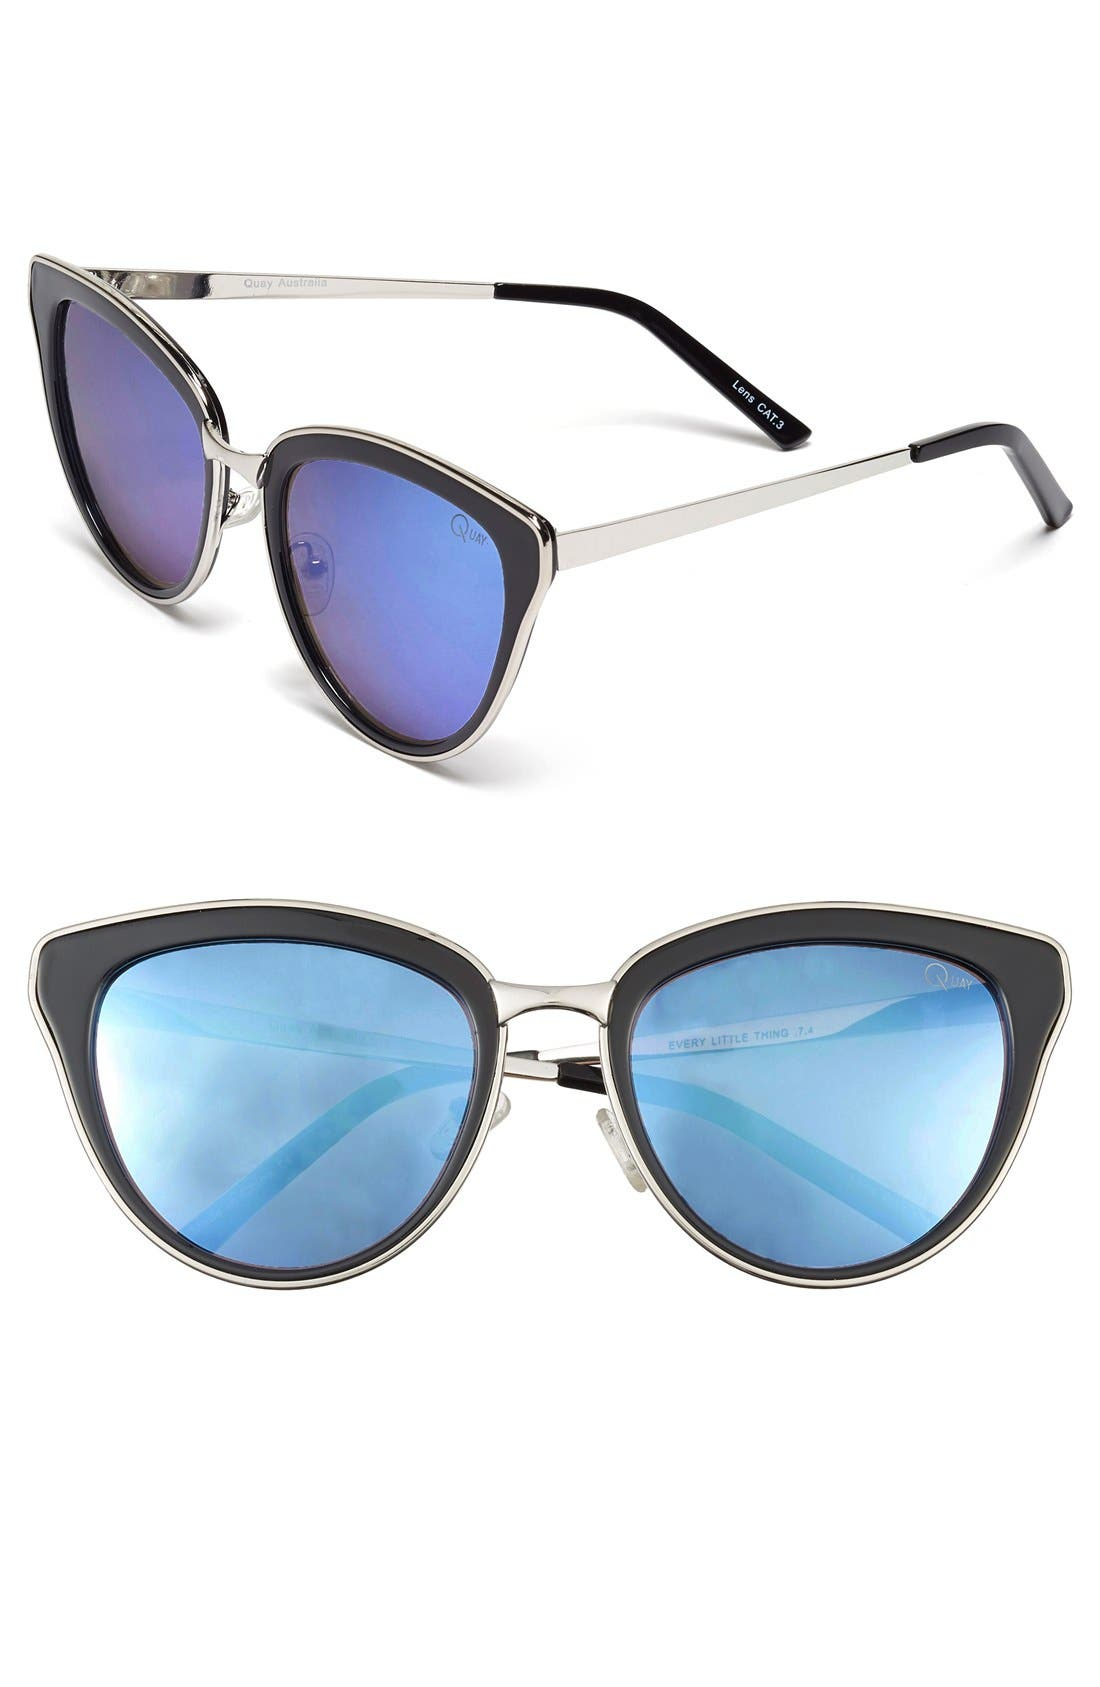 Alternate Image 1 Selected - Quay Australia 'Every Little Thing' 54mm Cat Eye Sunglasses